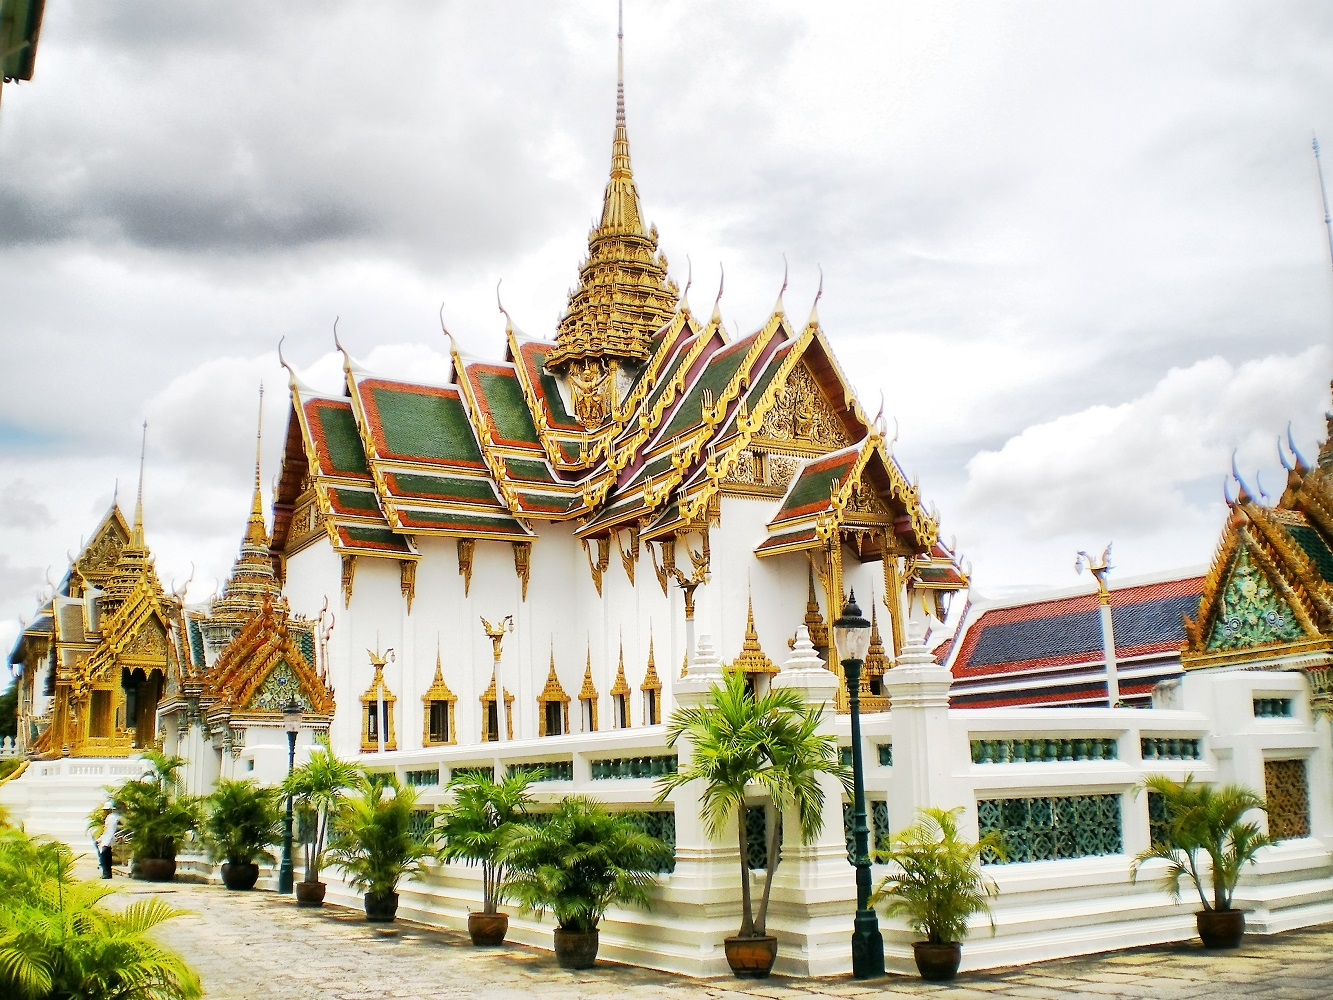 River City Shopping Complex in Bangkok